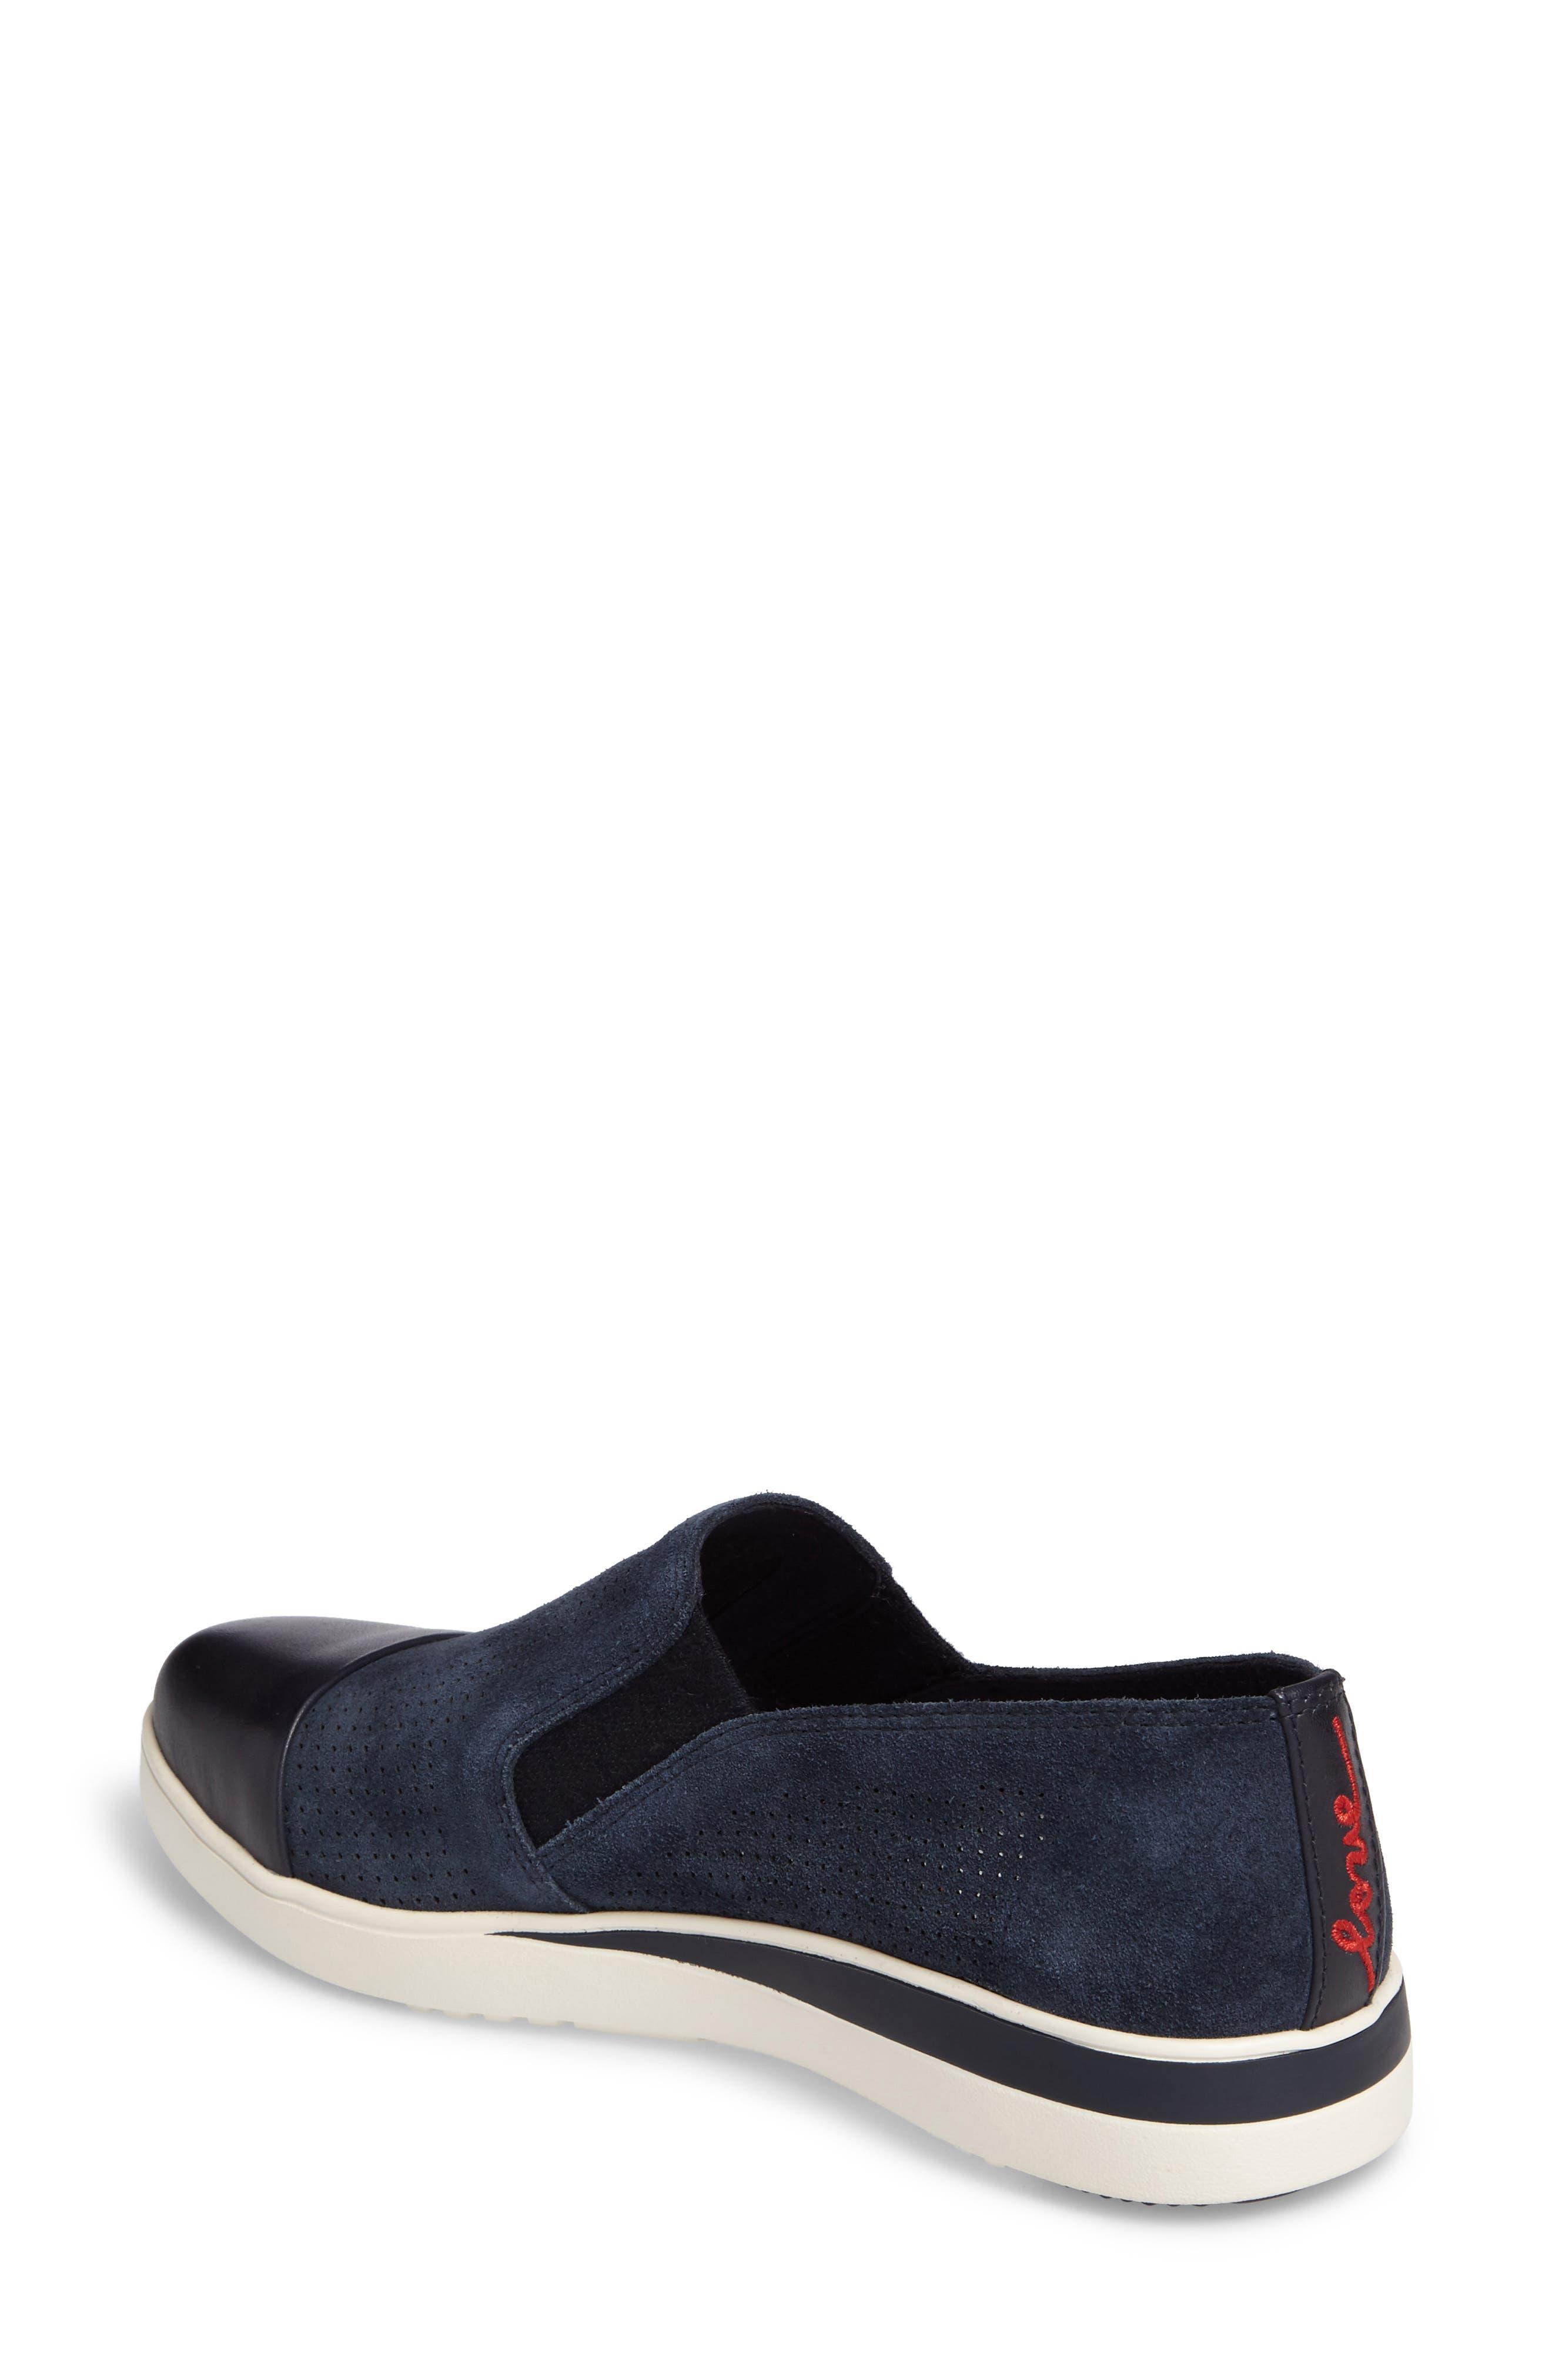 Aviana Cap Toe Slip-On Sneaker,                             Alternate thumbnail 2, color,                             Lagoon Suede